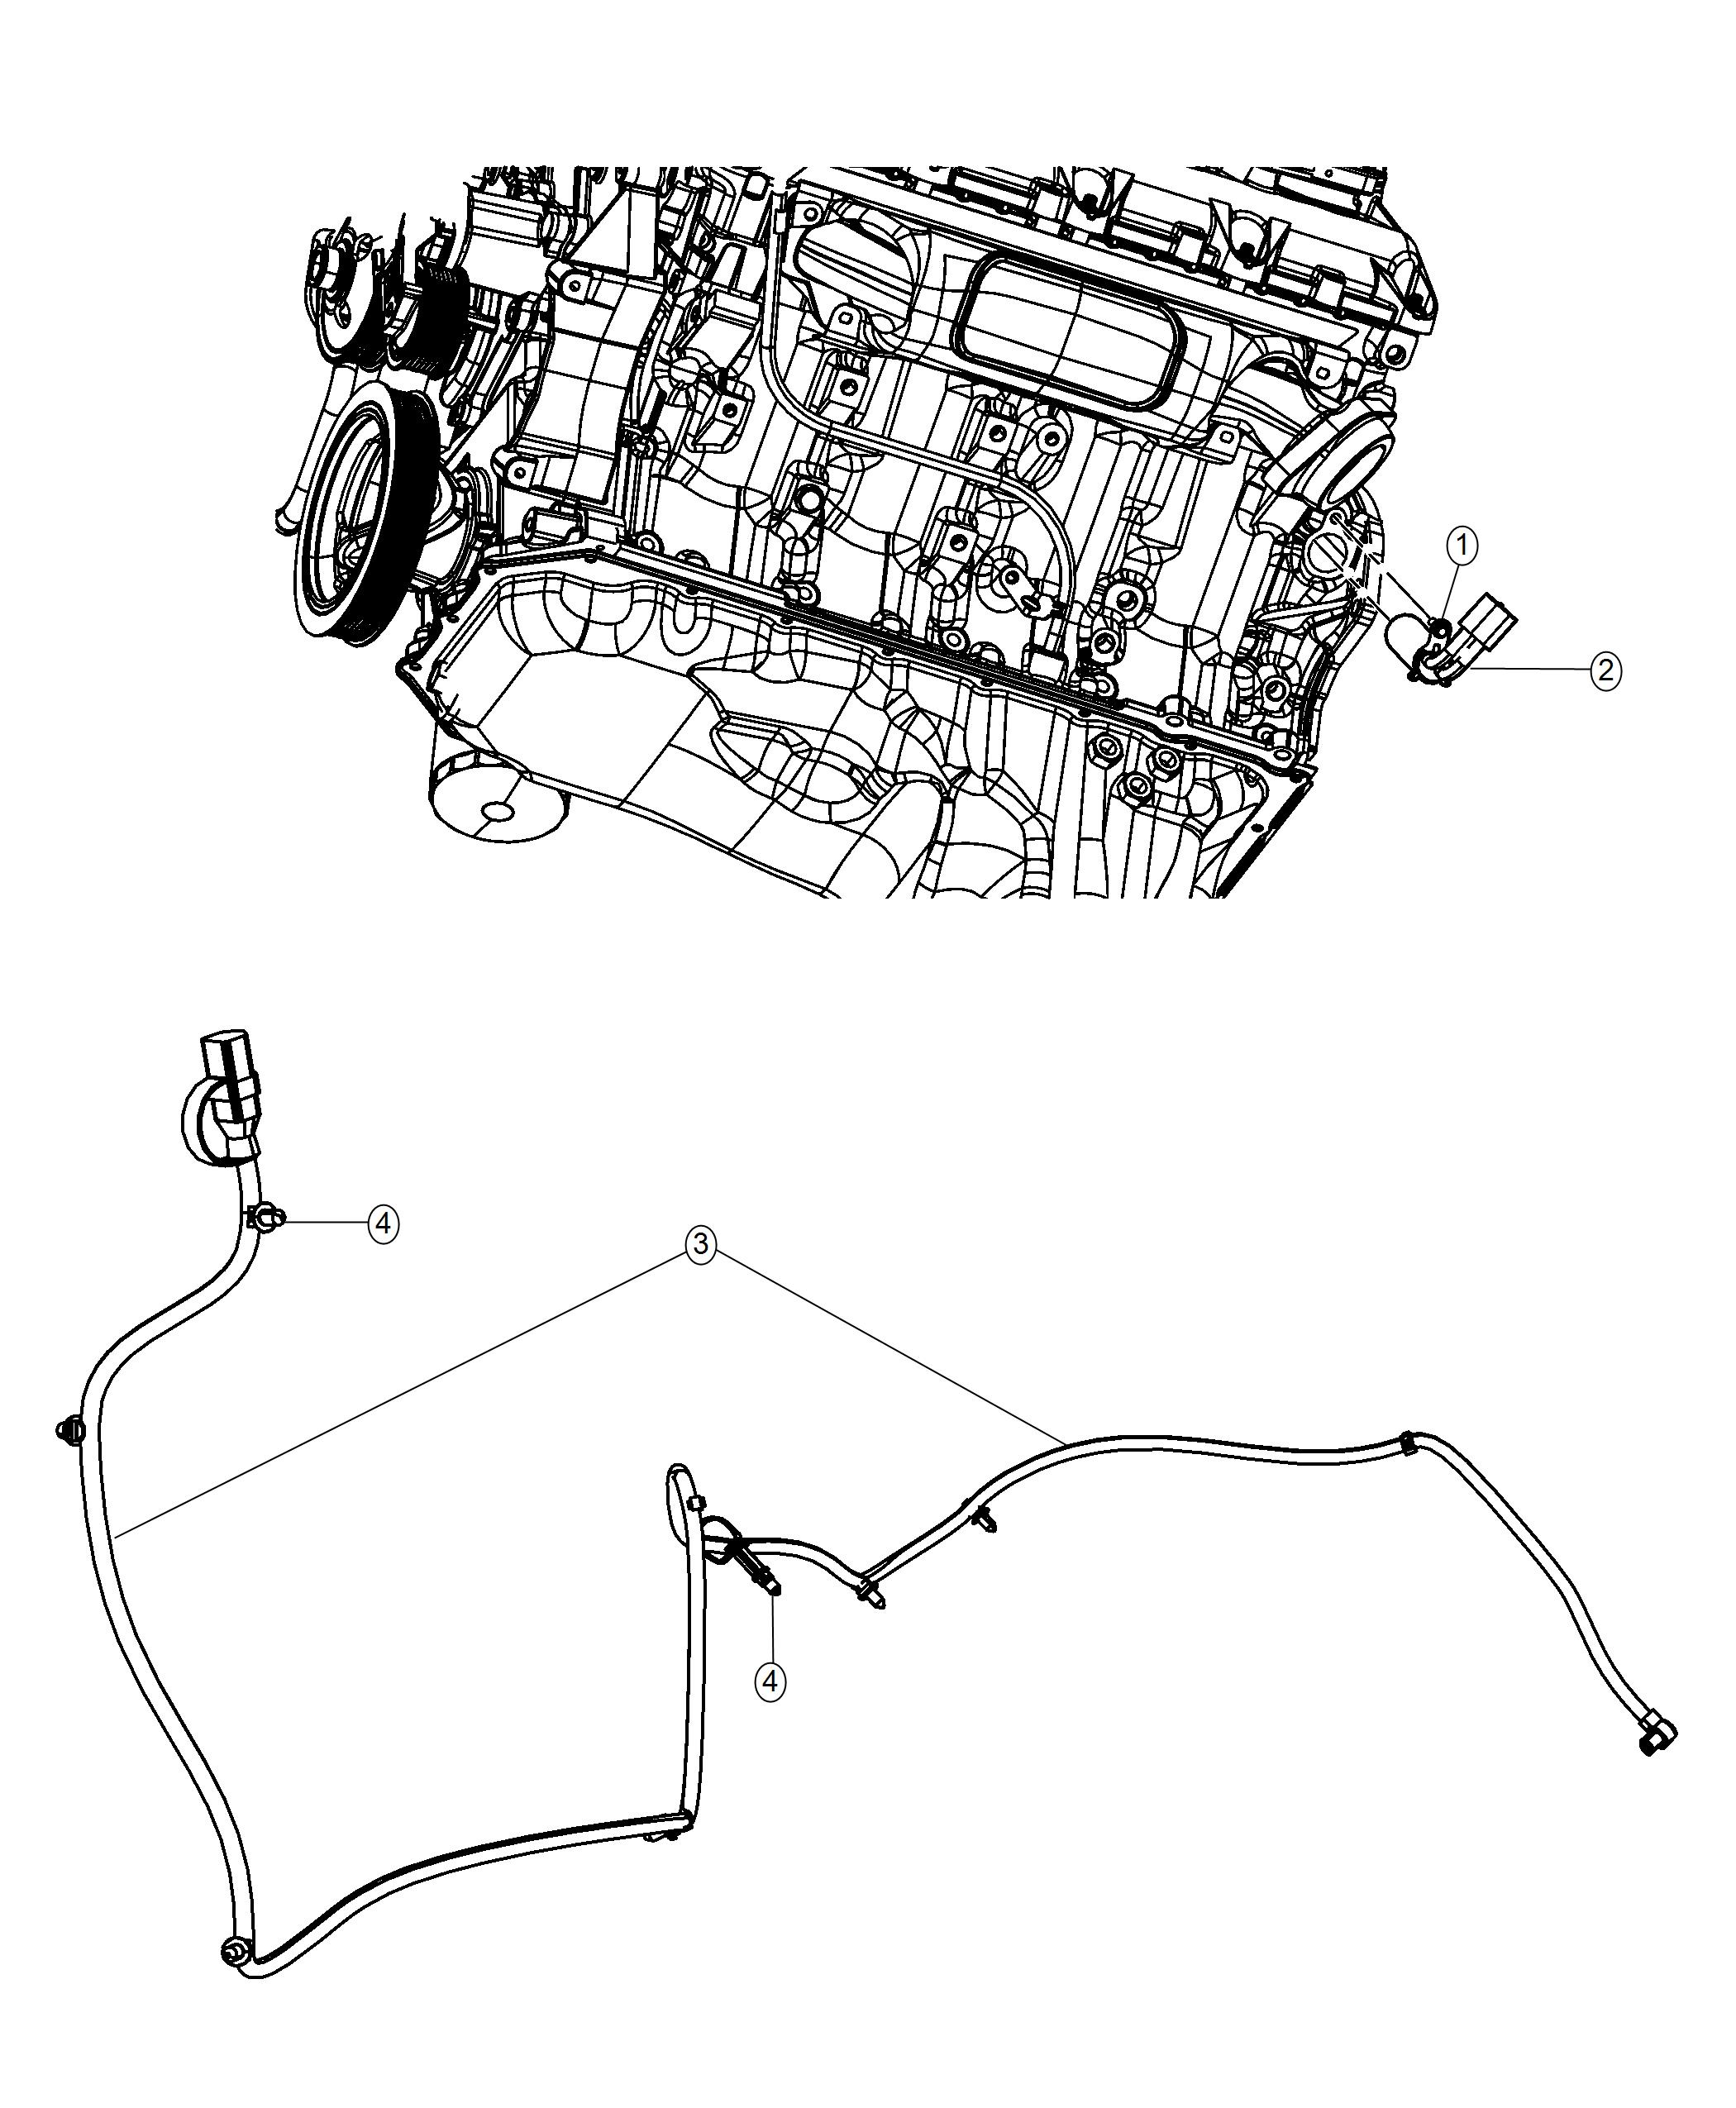 Ram 1500 Cord. Engine block heater. [engine block heater